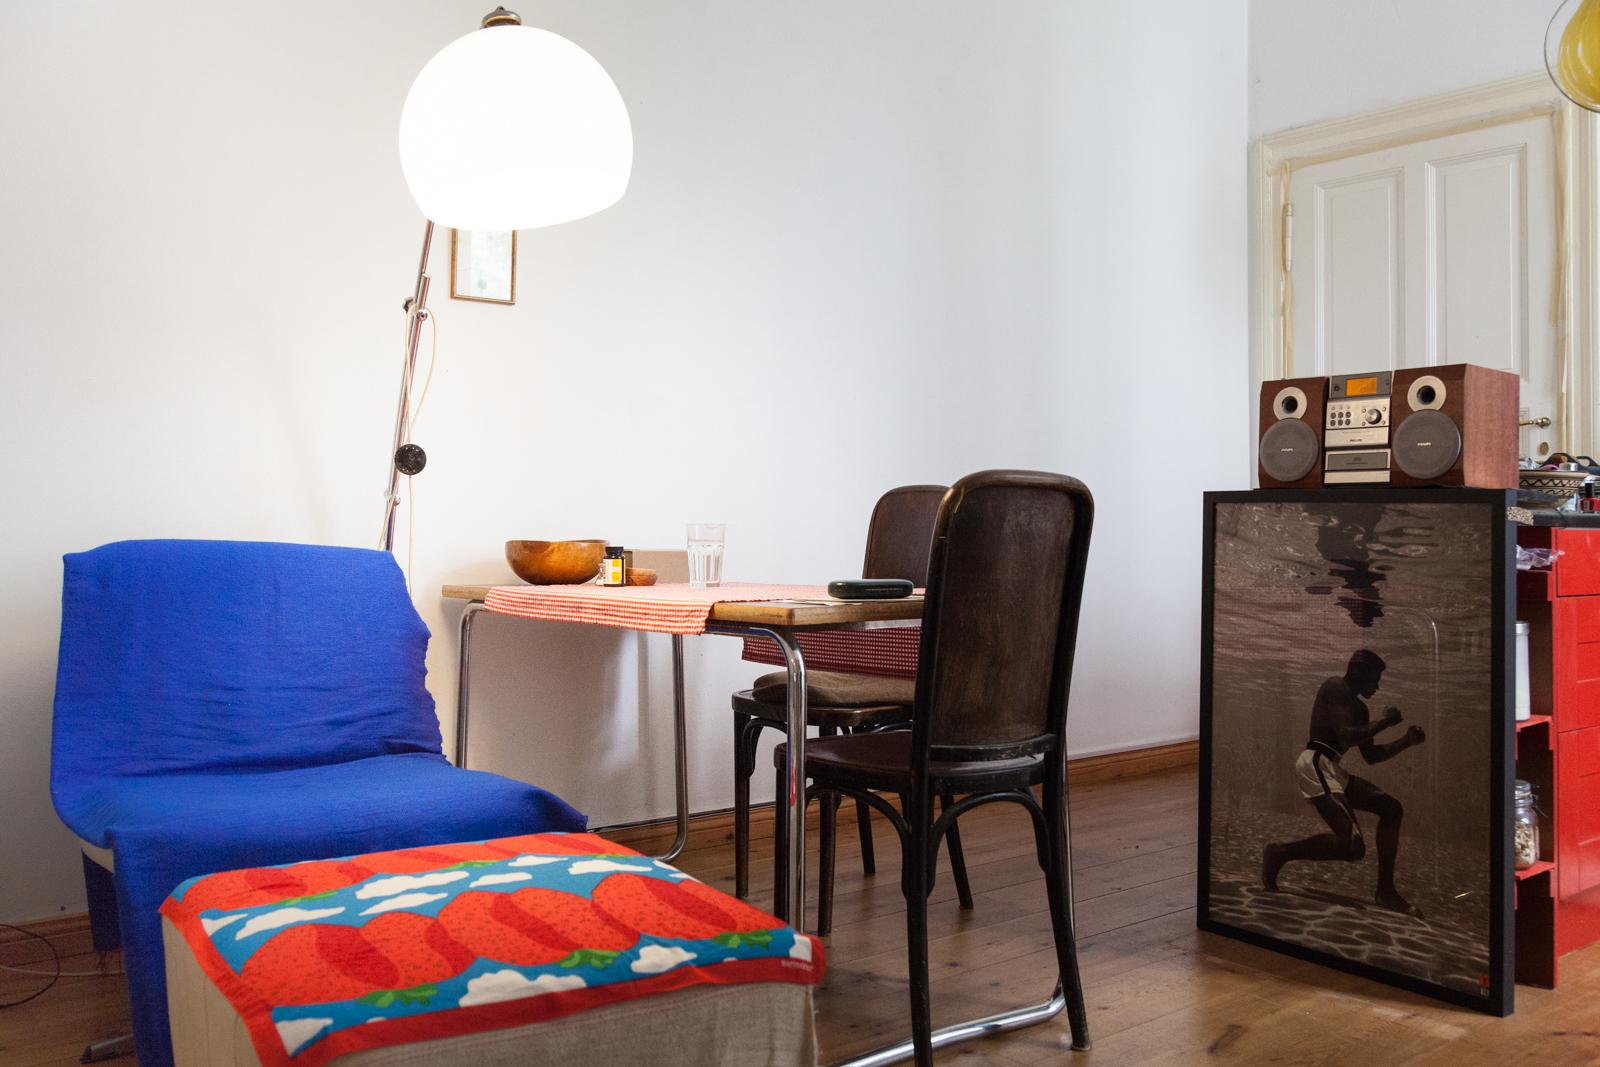 Kitchen and Livingroom